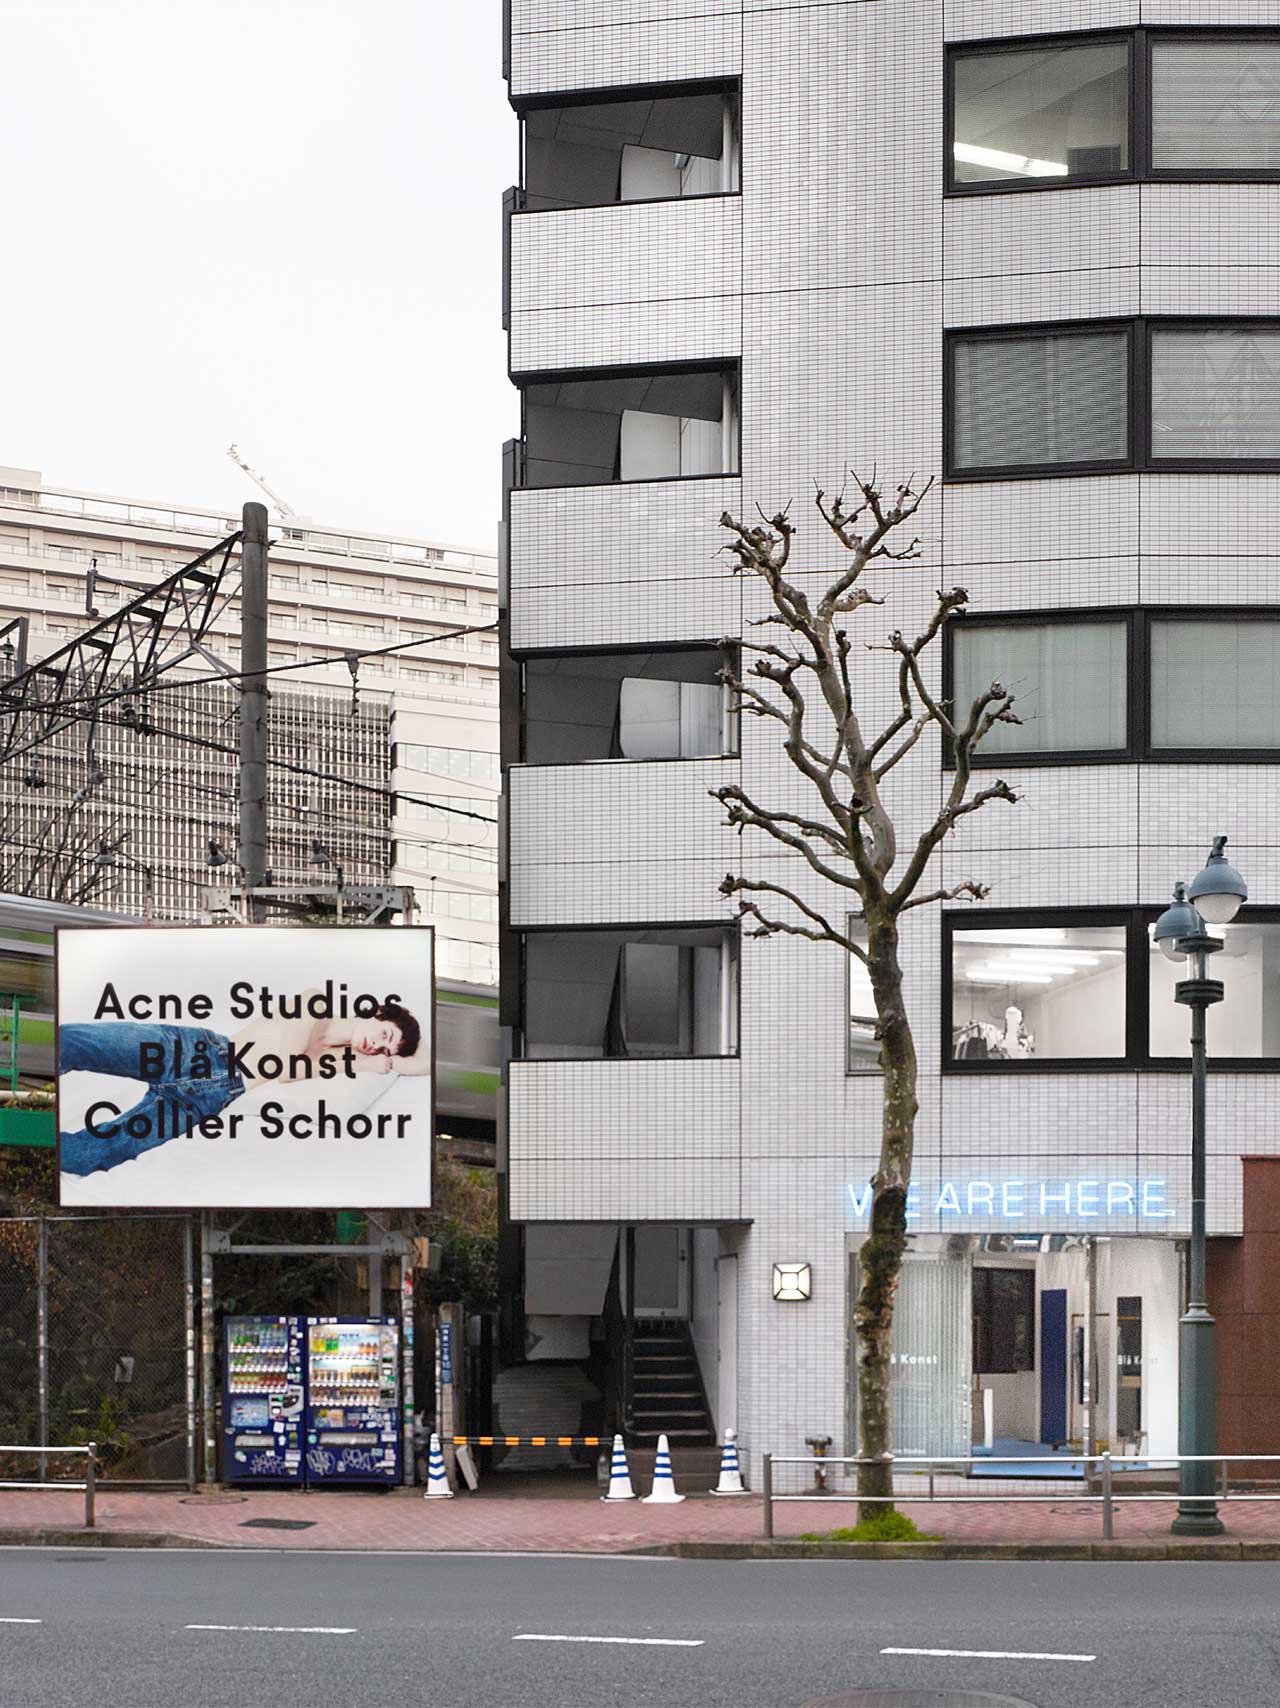 Bla-Konst-Acne-Studios-Denim-Line-and-Retail-Space-Tokyo-Yellowtrace-06.jpg